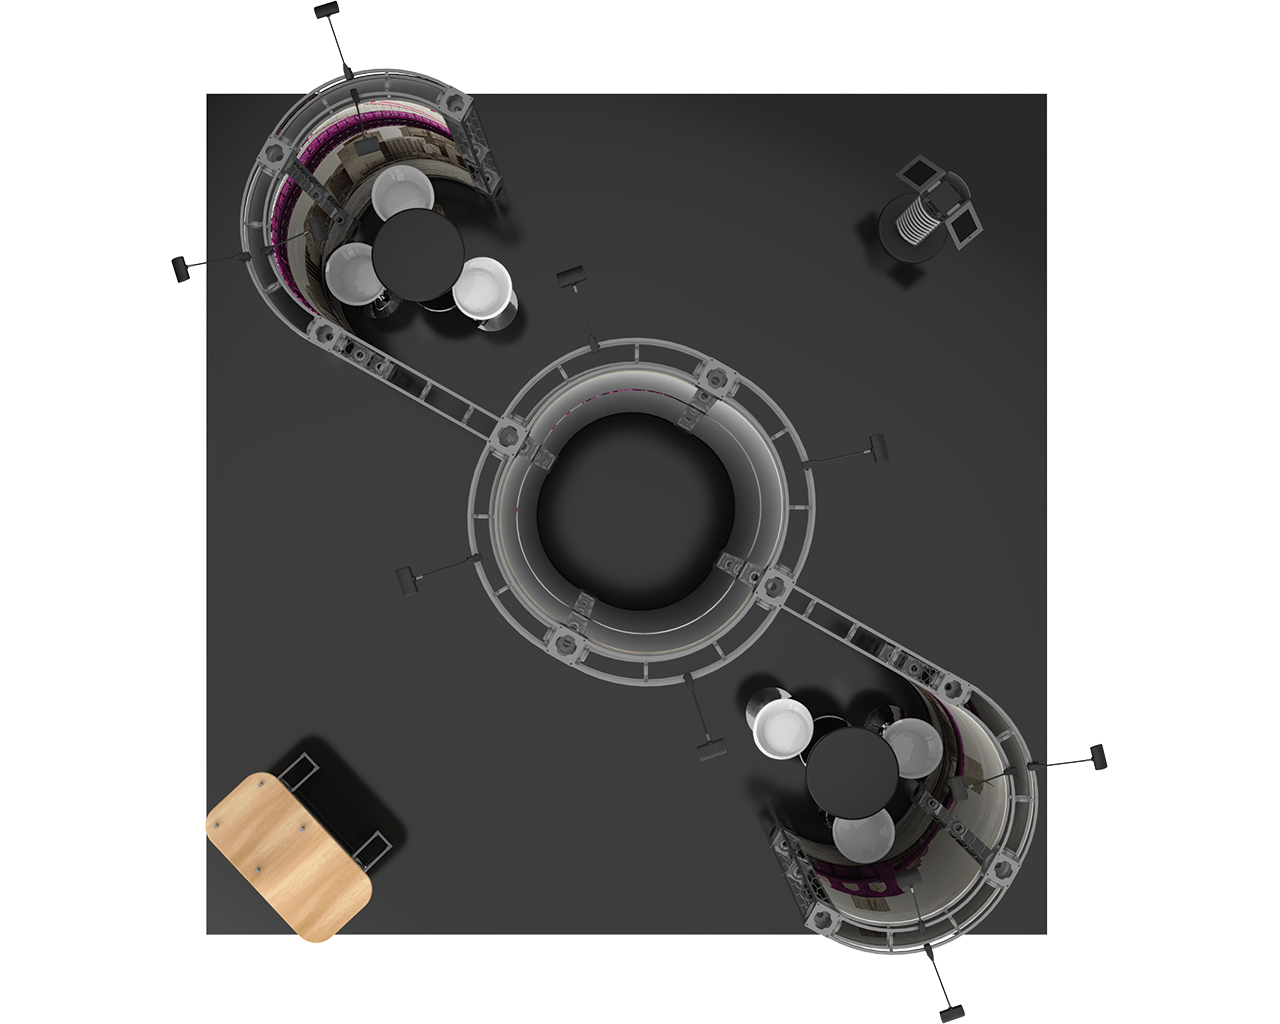 Zenit 20 x 20 Orbital Truss